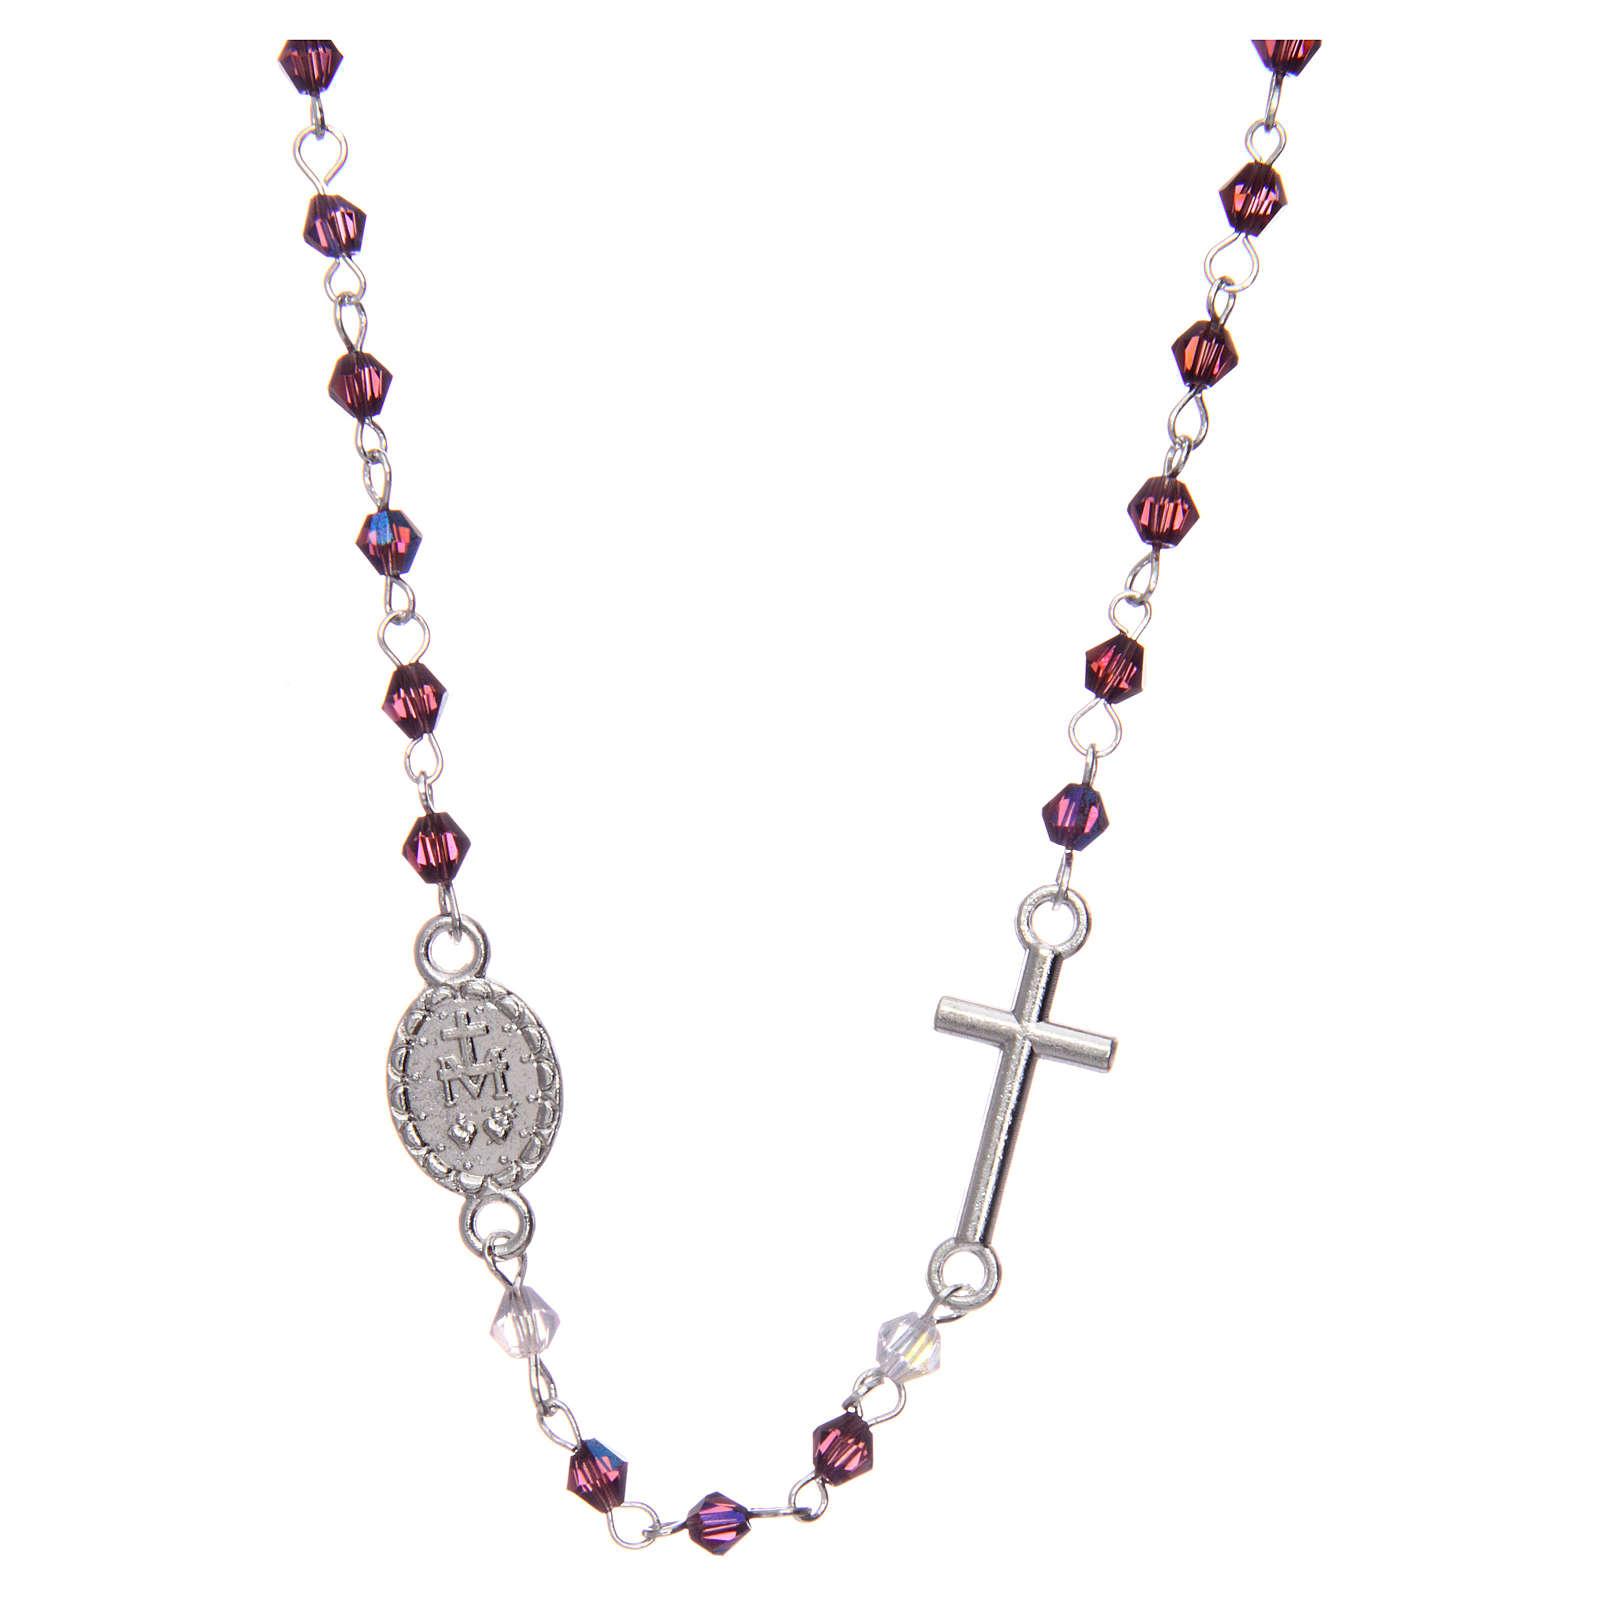 Chapelet collier mi-cristal ovale 3 mm violet iridescent 4